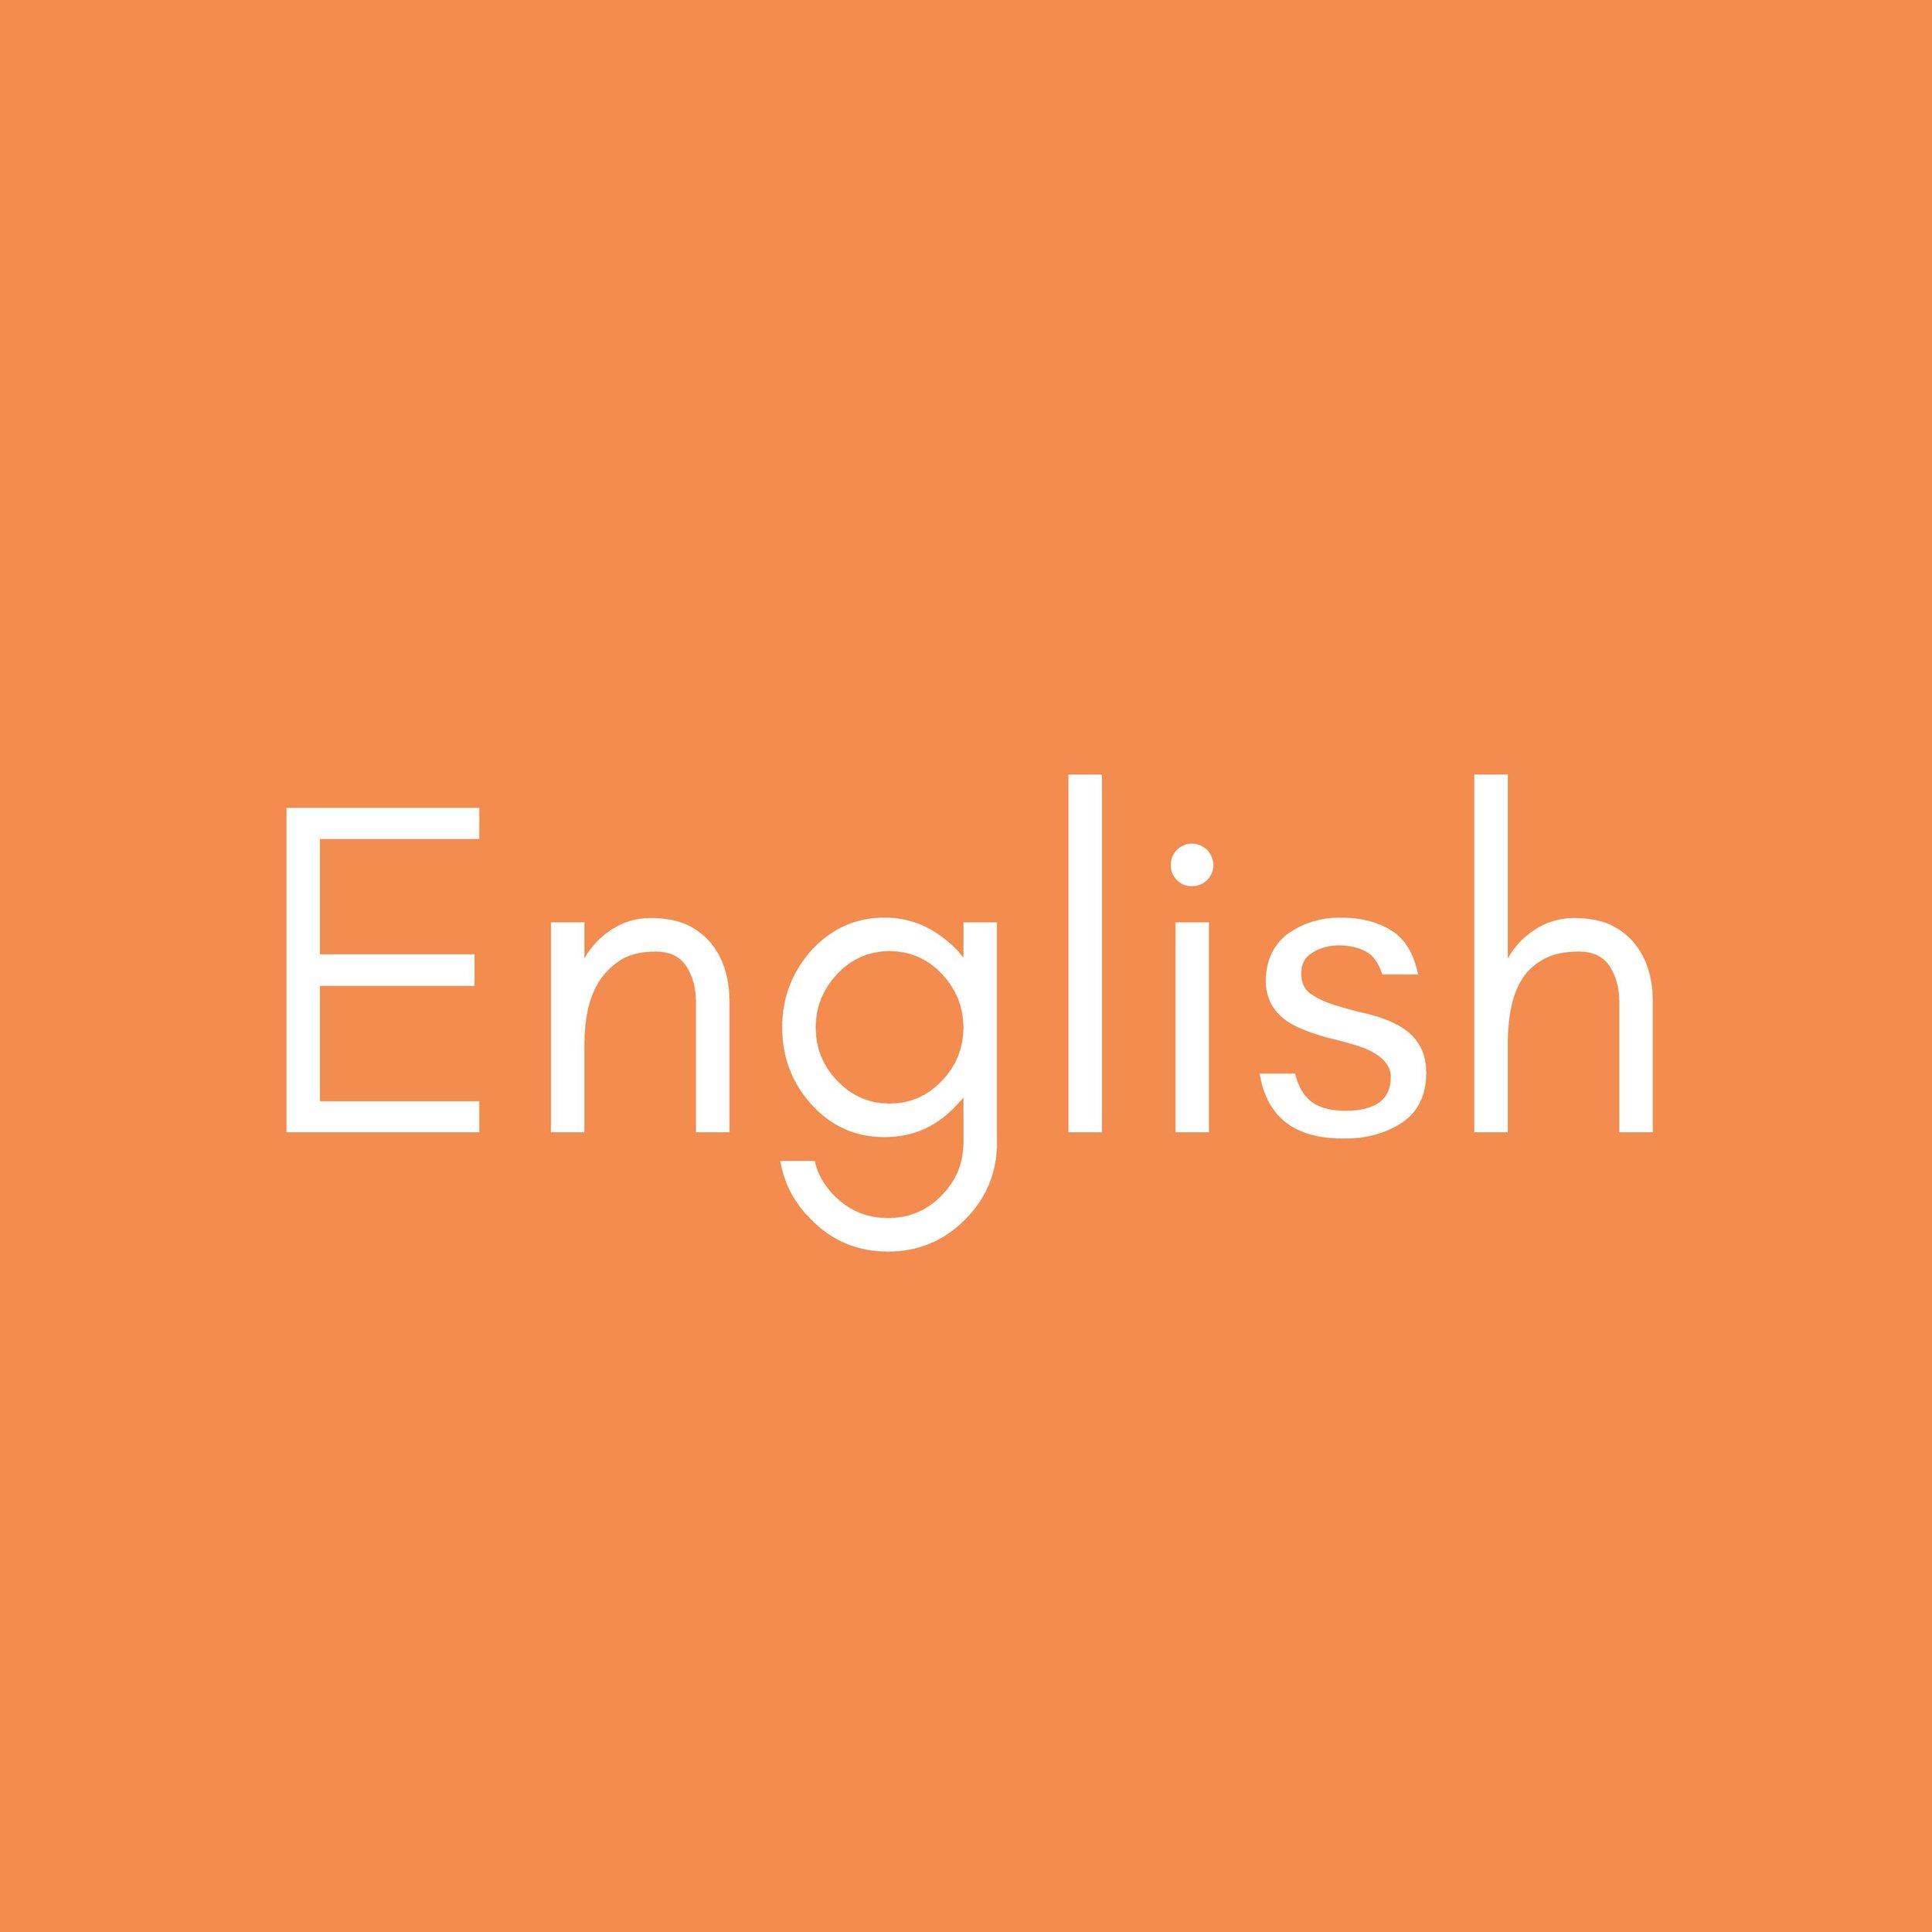 English-page-001.jpg